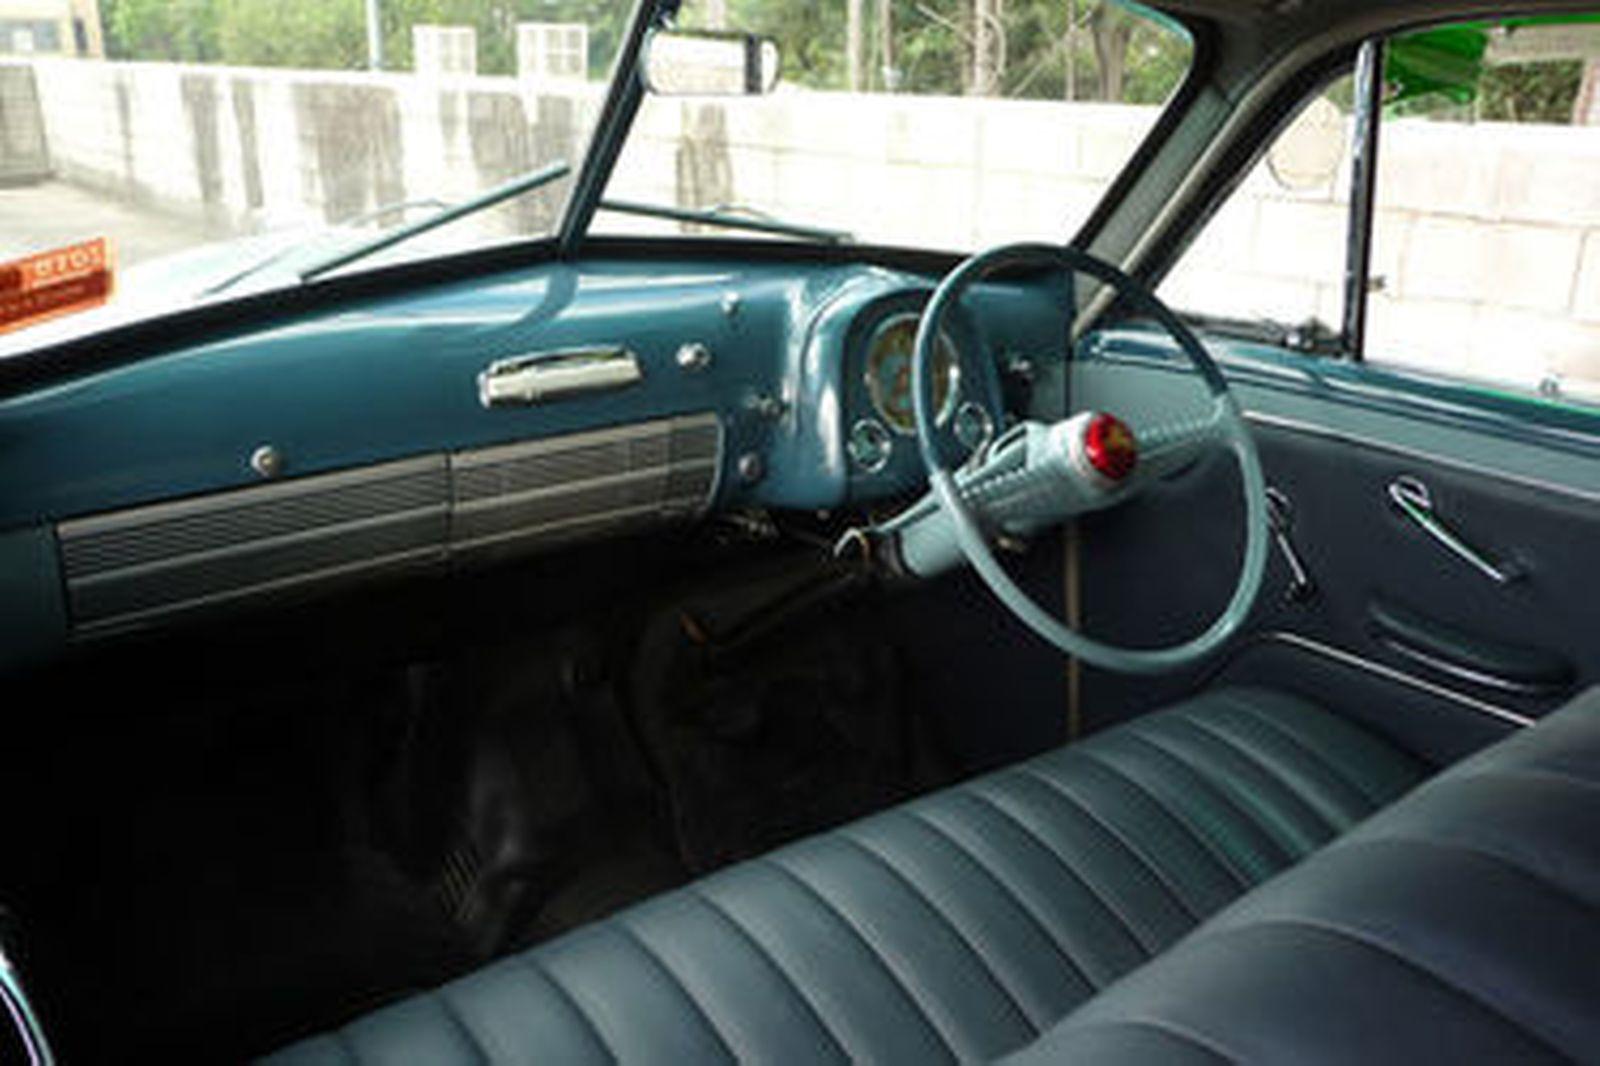 Holden FJ Special Sedan Auctions - Lot 12 - Shannons